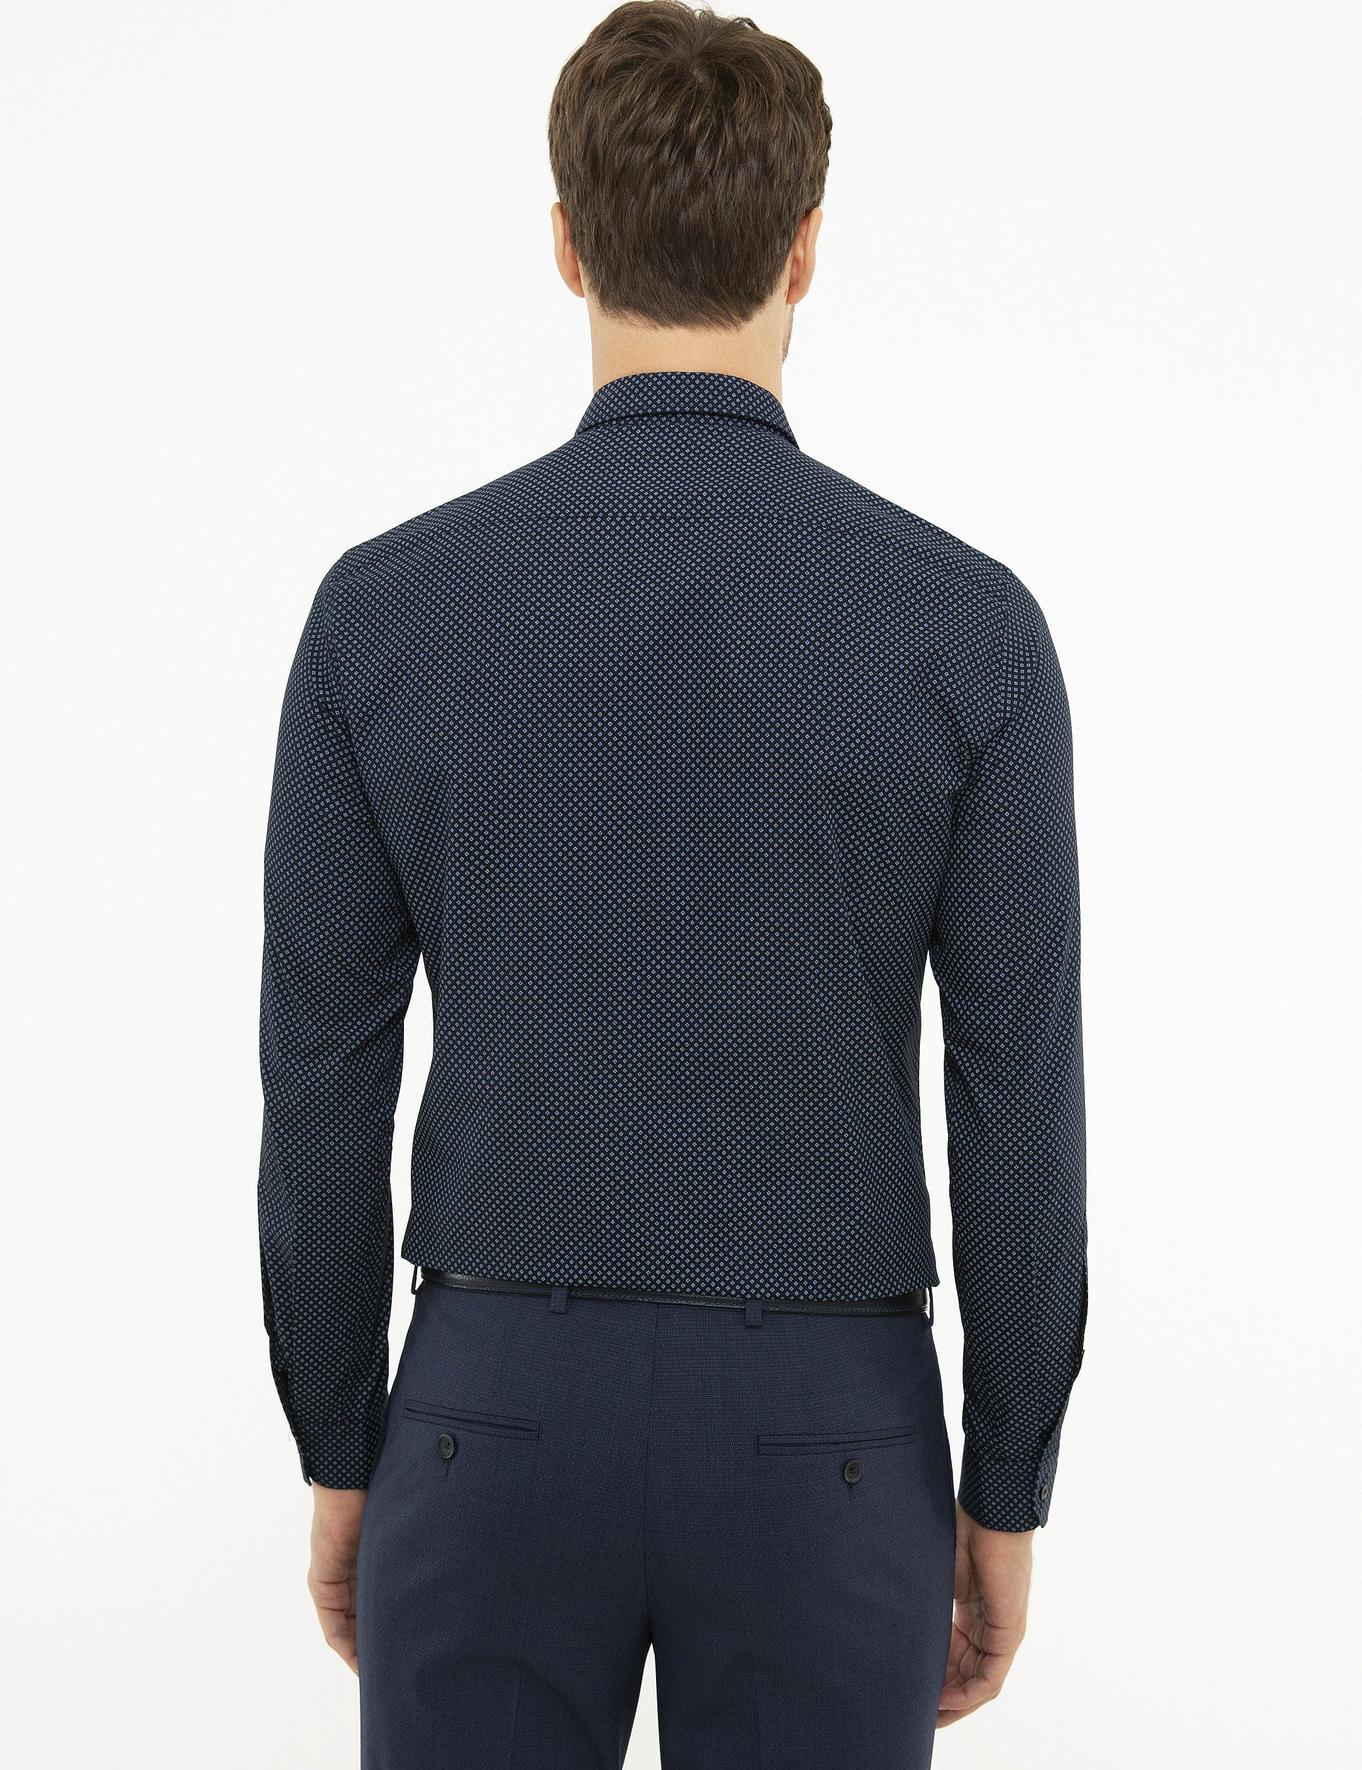 Lacivert Slim Fit Gömlek - 50218075004